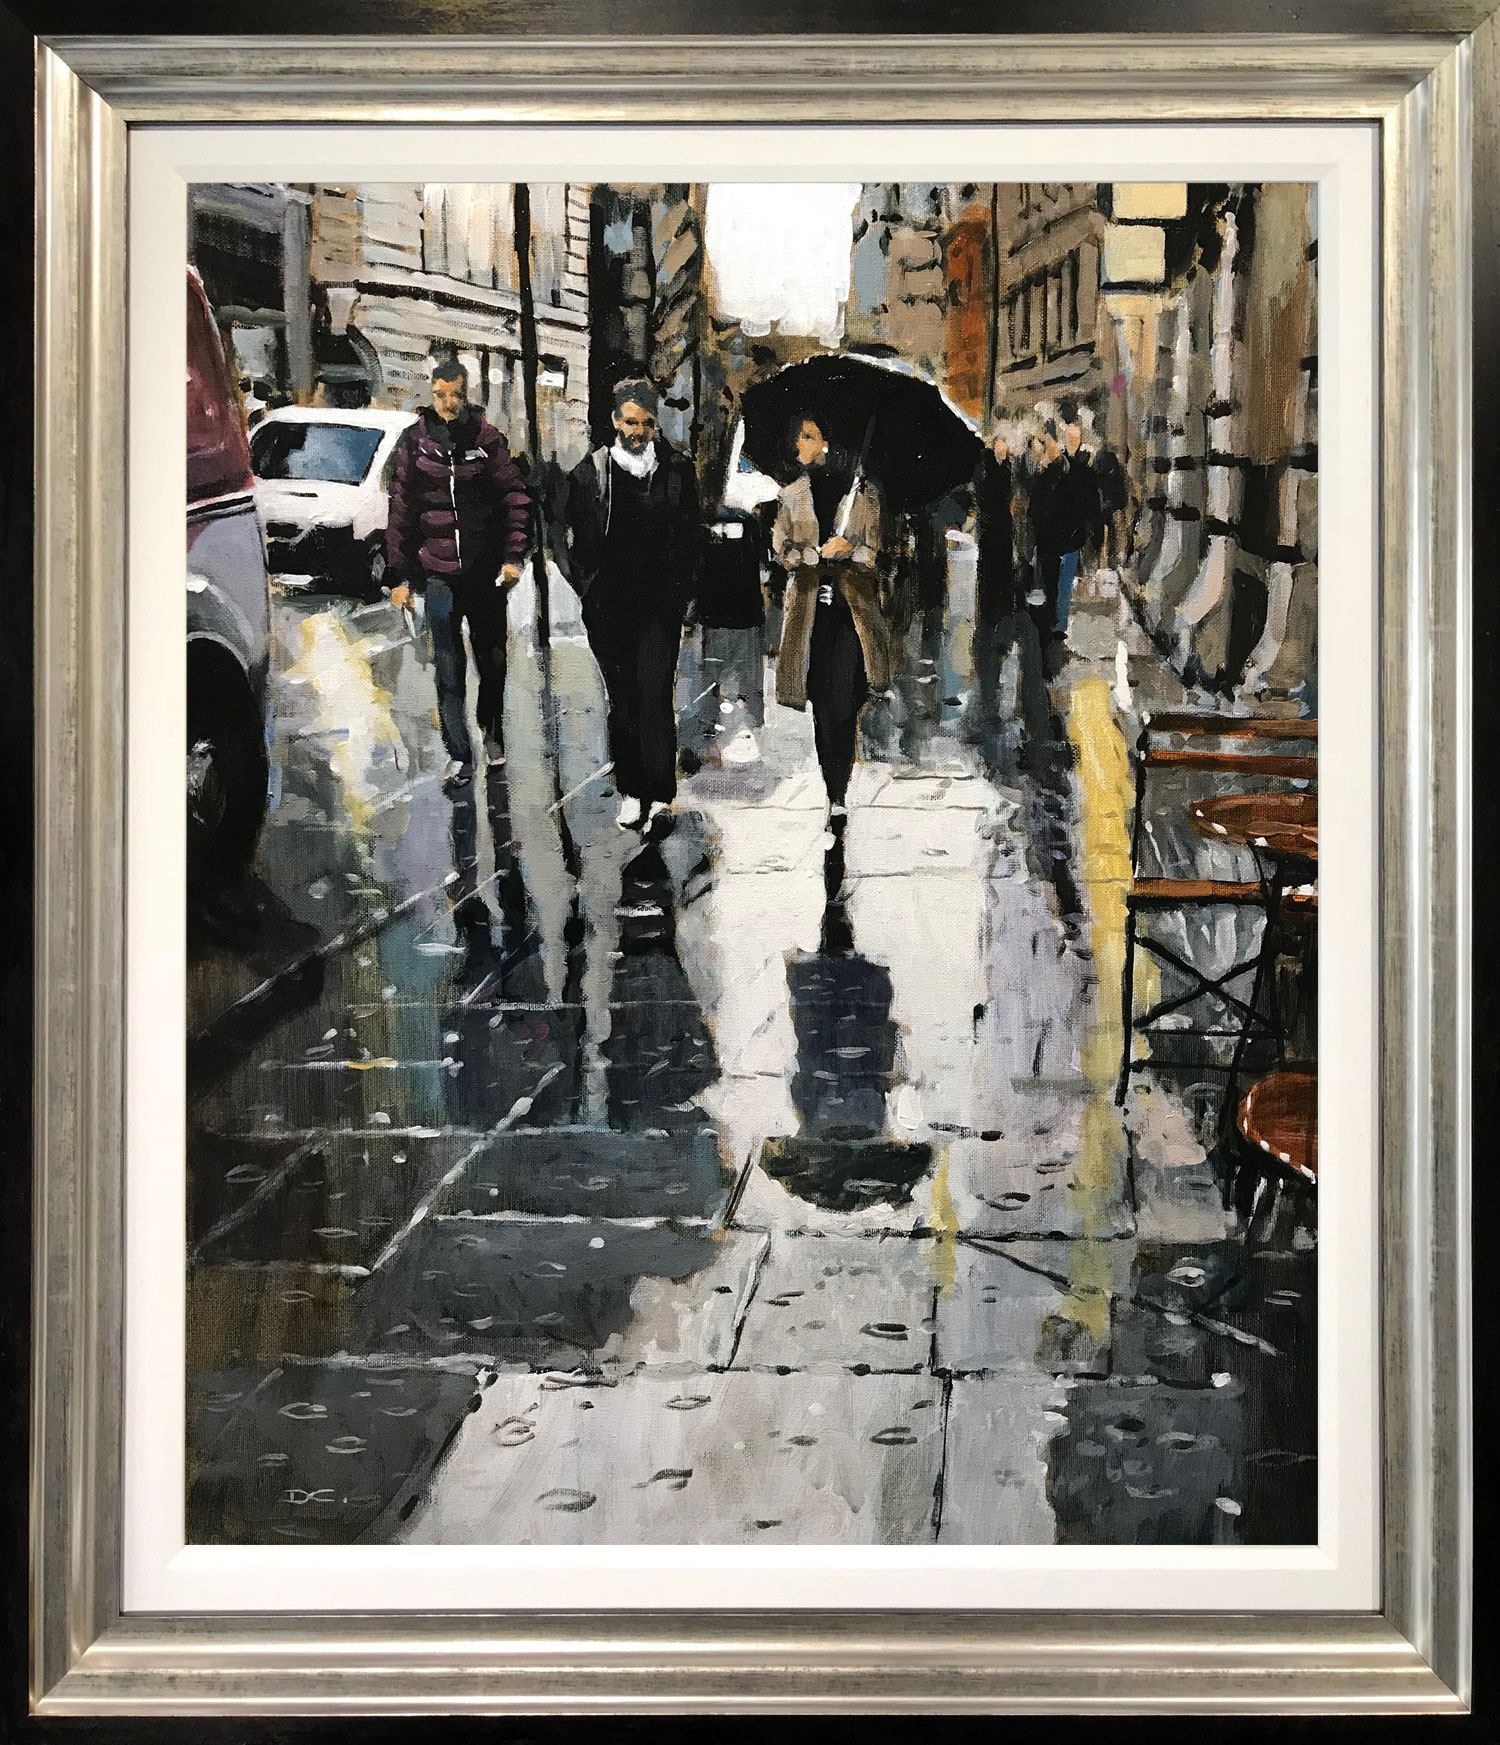 David Coulter Rain Trio, Cross Street Original Painting for sale